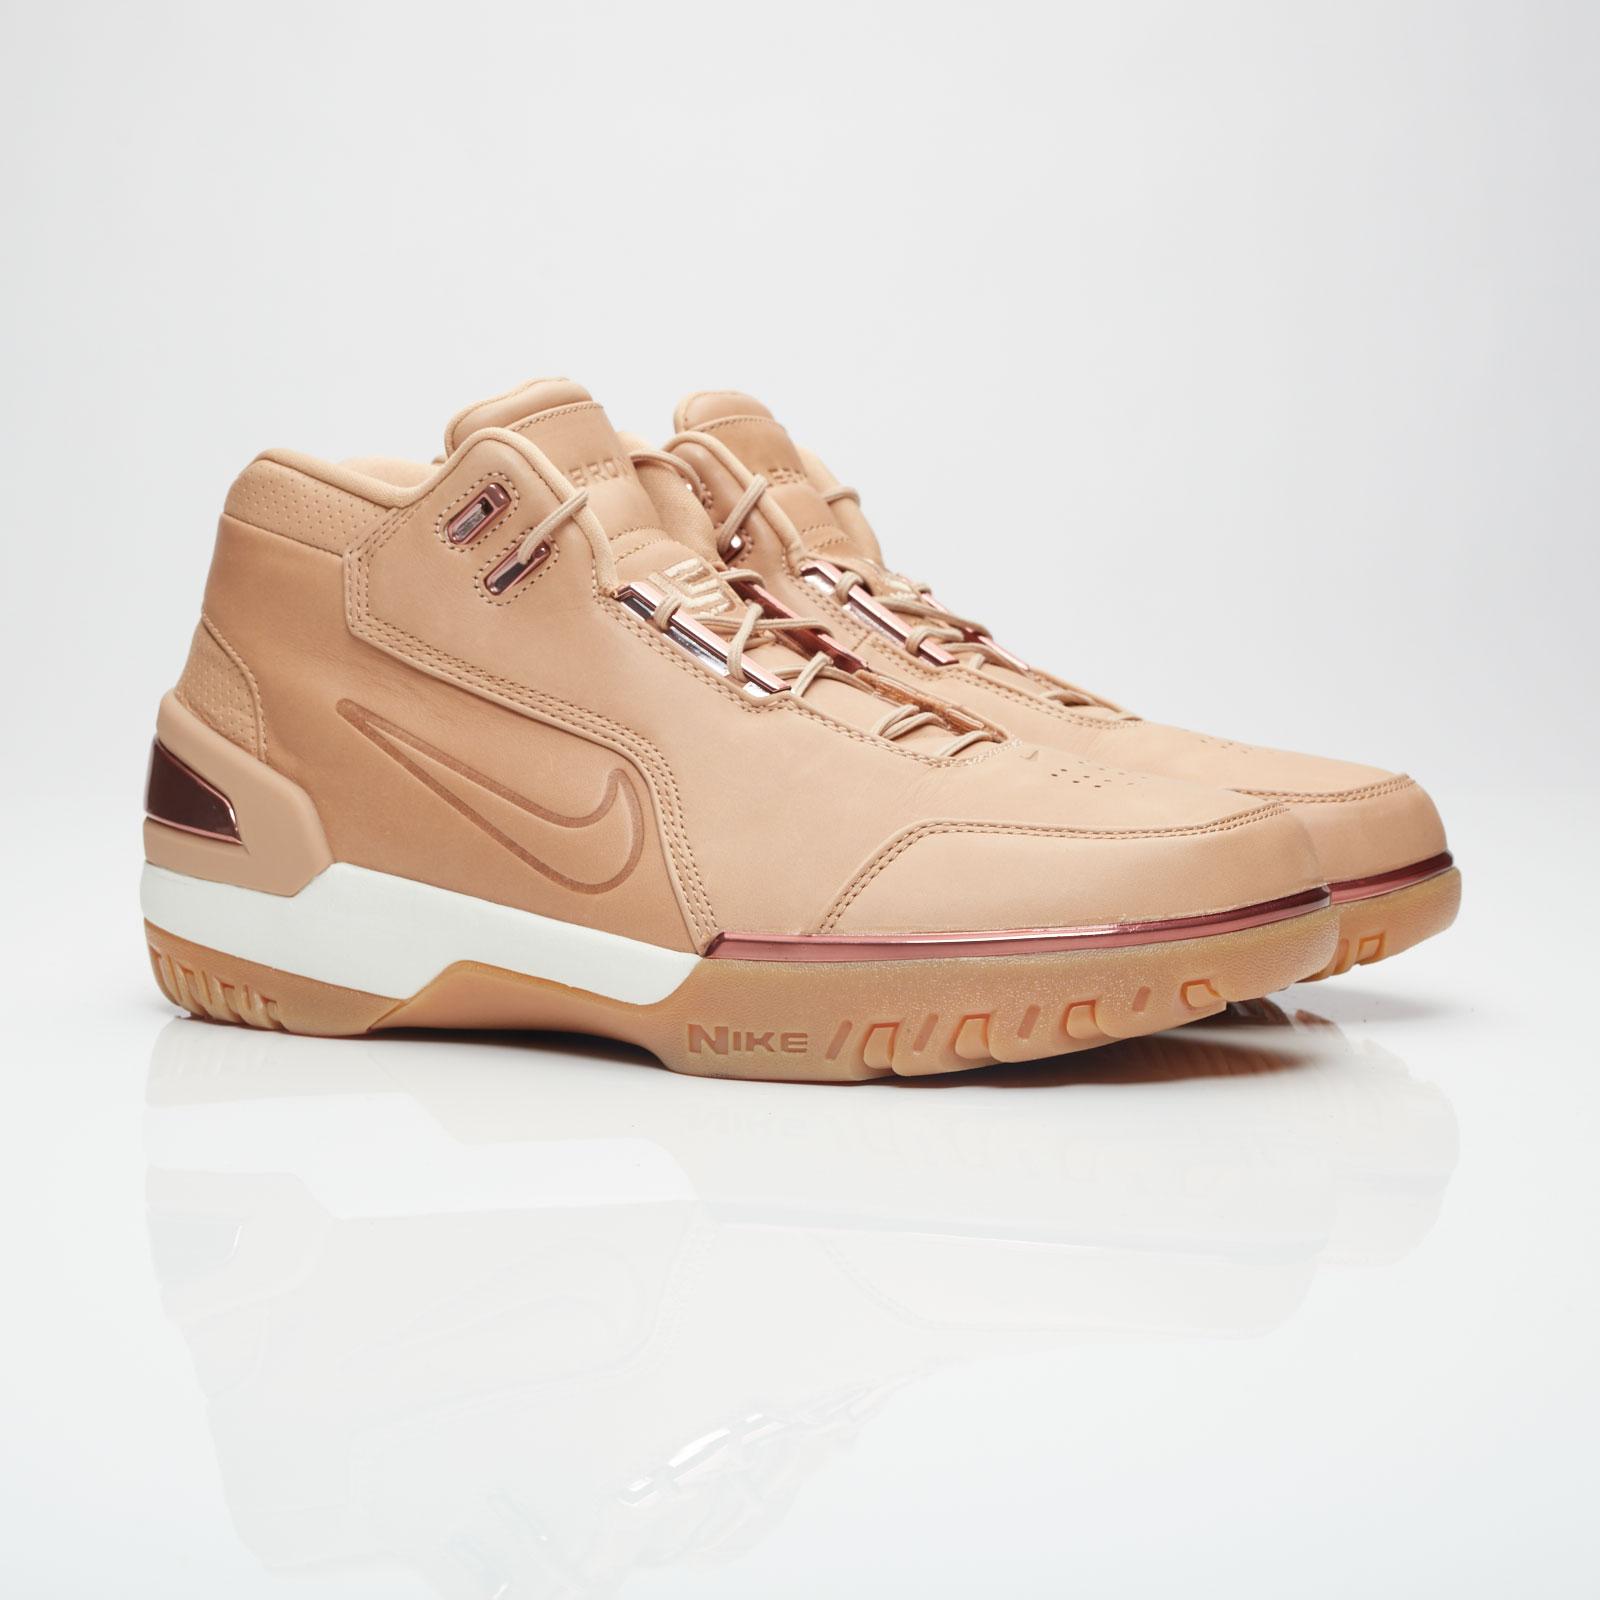 e3f530fd0088 Nike Air Zoom Generation As Qs - 308214-200 - Sneakersnstuff ...